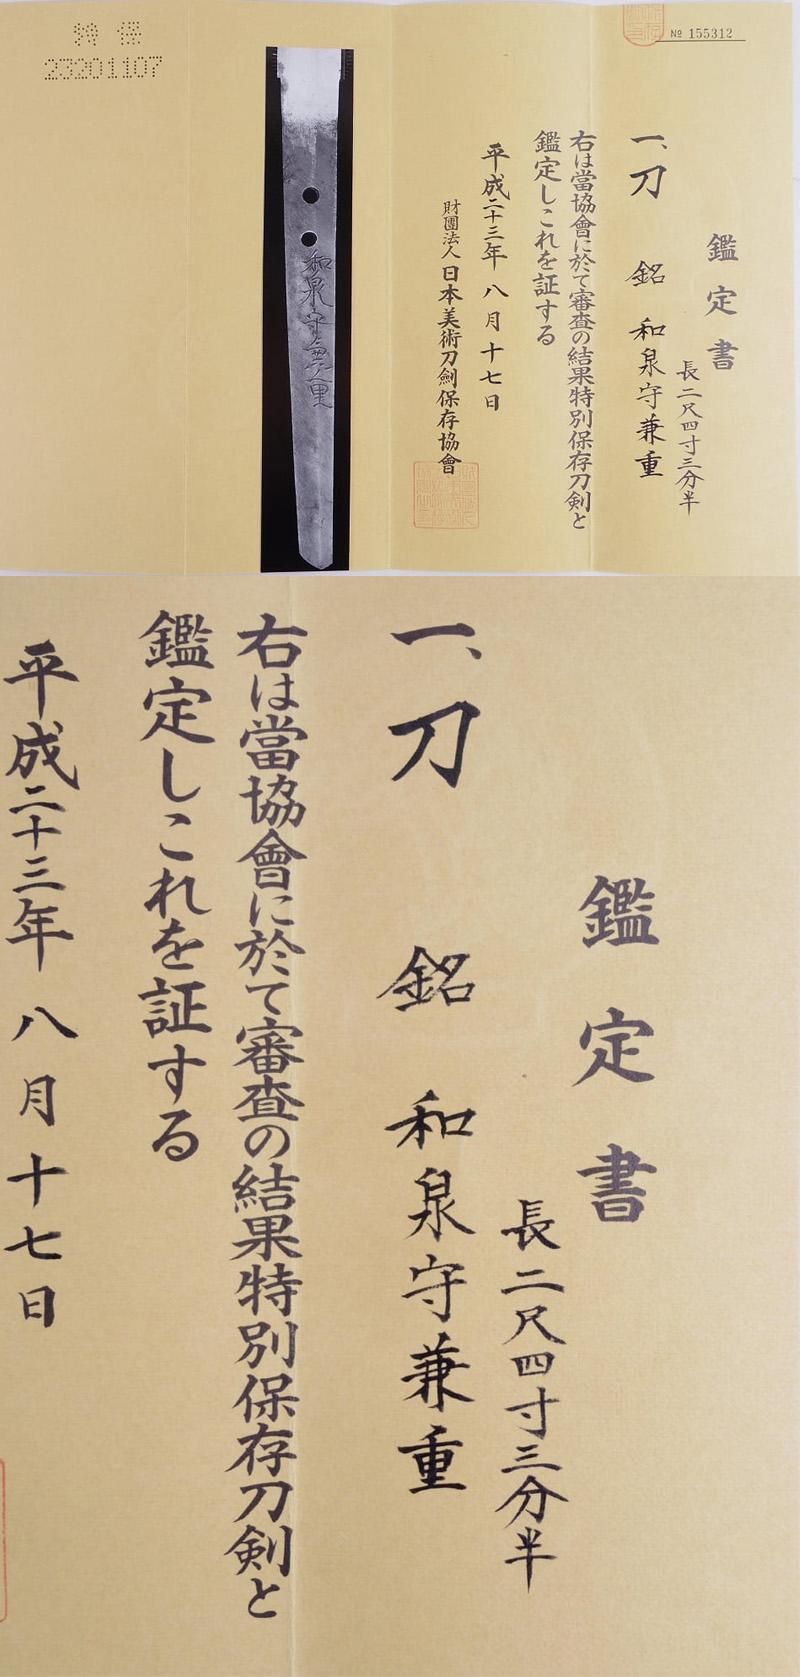 刀 和泉守兼重 (宮本武蔵の愛刀) (新刀 上々作) (良業物) Picture of Certificate